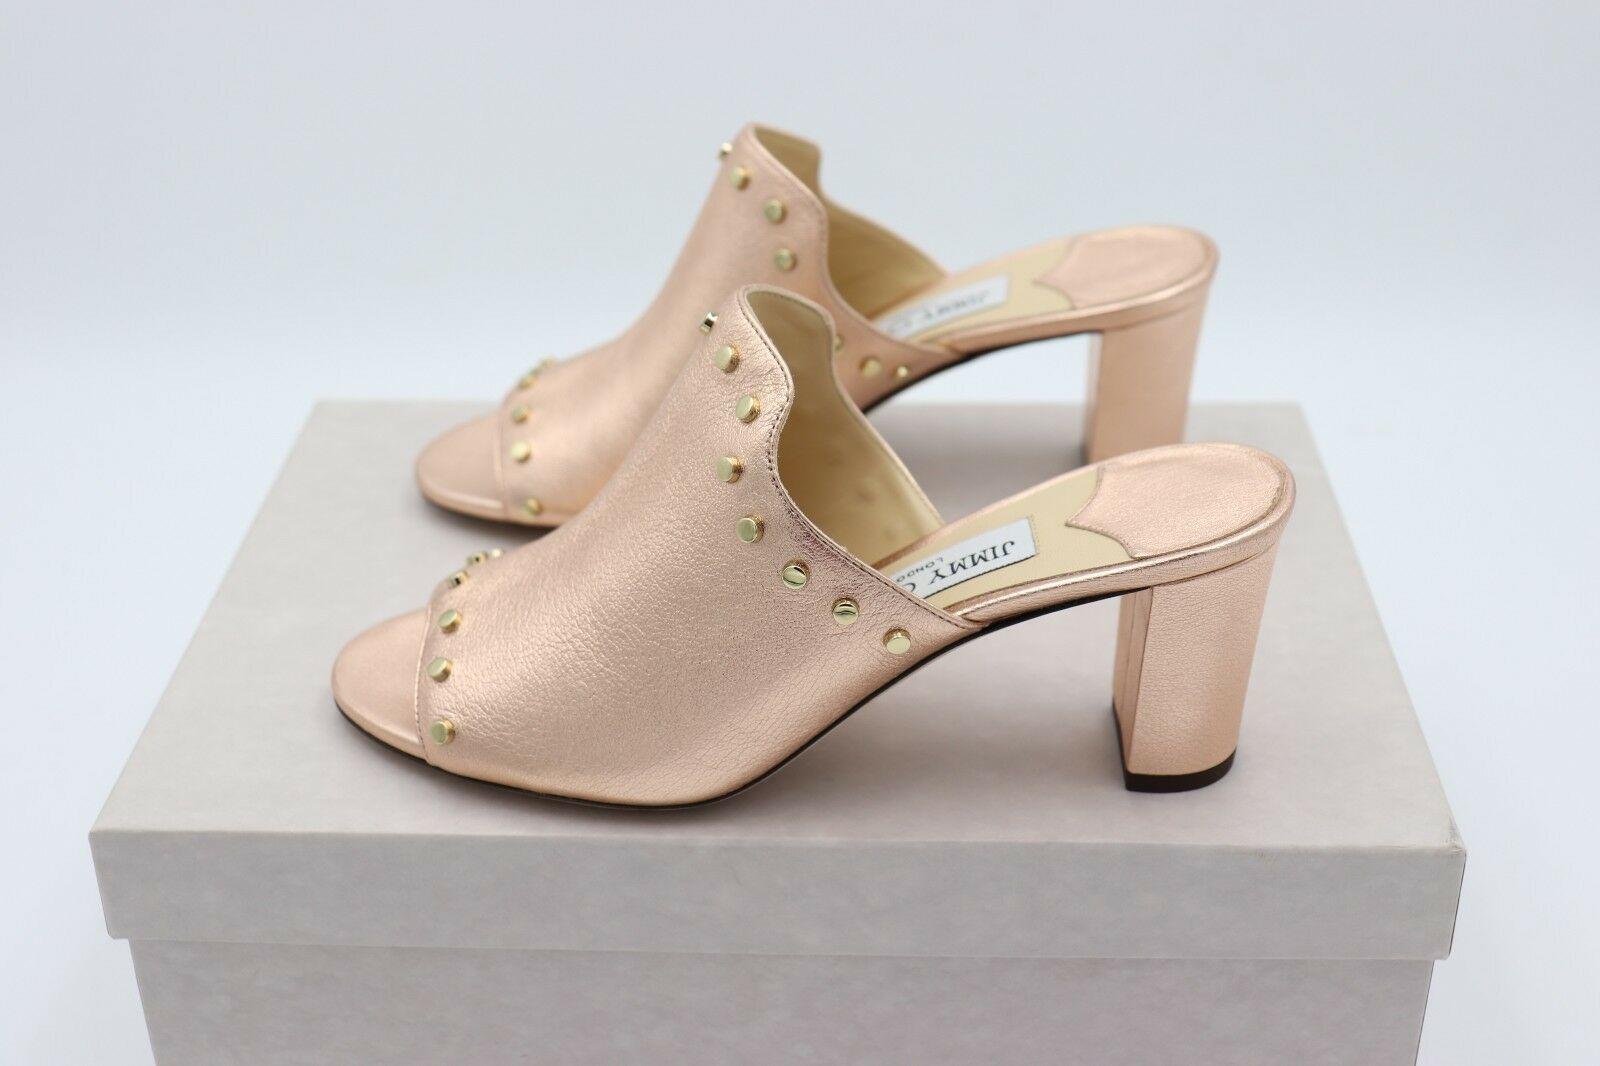 NIB Jimmy Choo Myla 65 Pink Metallic Leather Mules Sandals Gold Studs 7 37